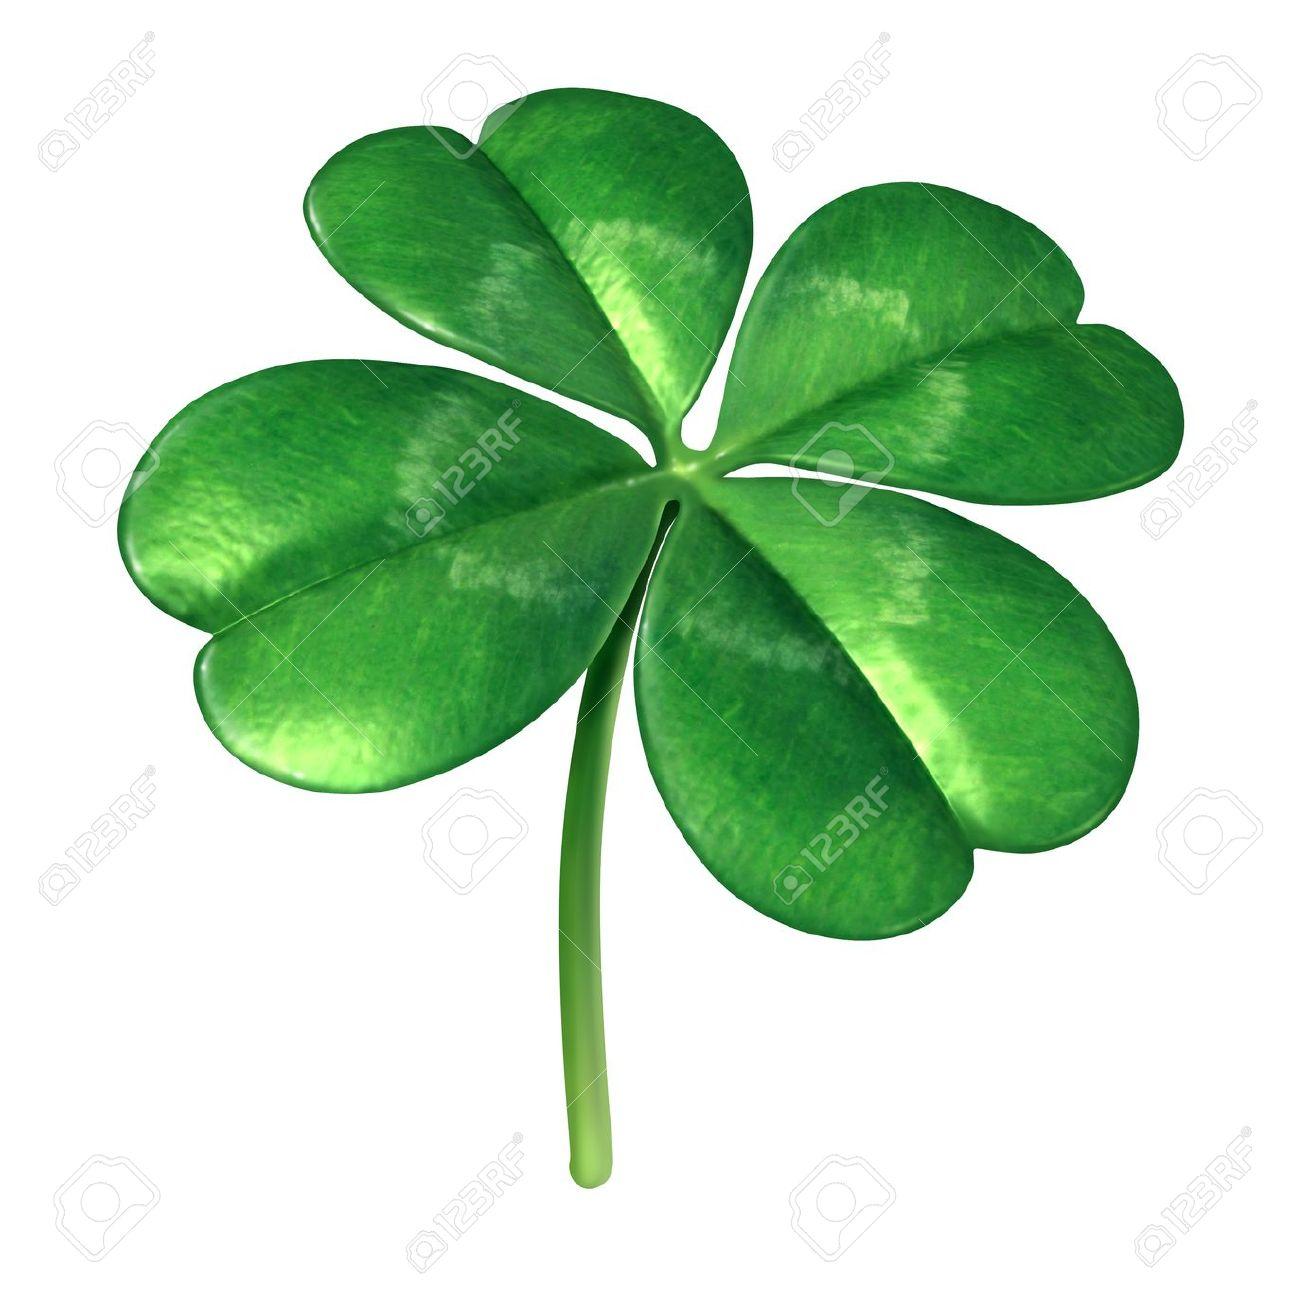 Four Leaf Clover Plant As An Irish Symbol For A Green Lucky Charm.